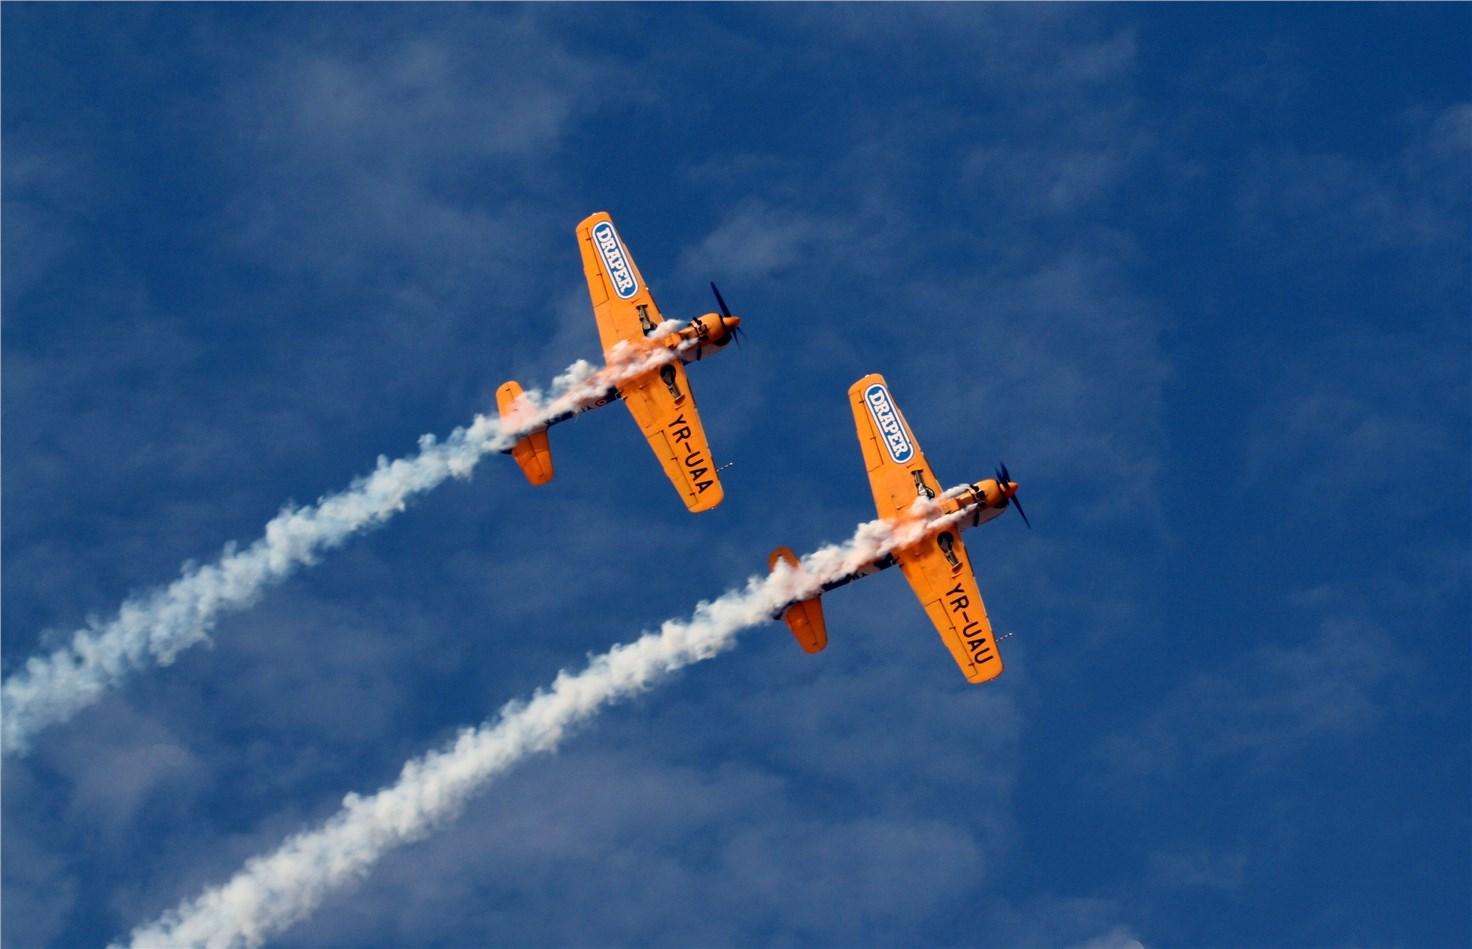 Two Orange Jets